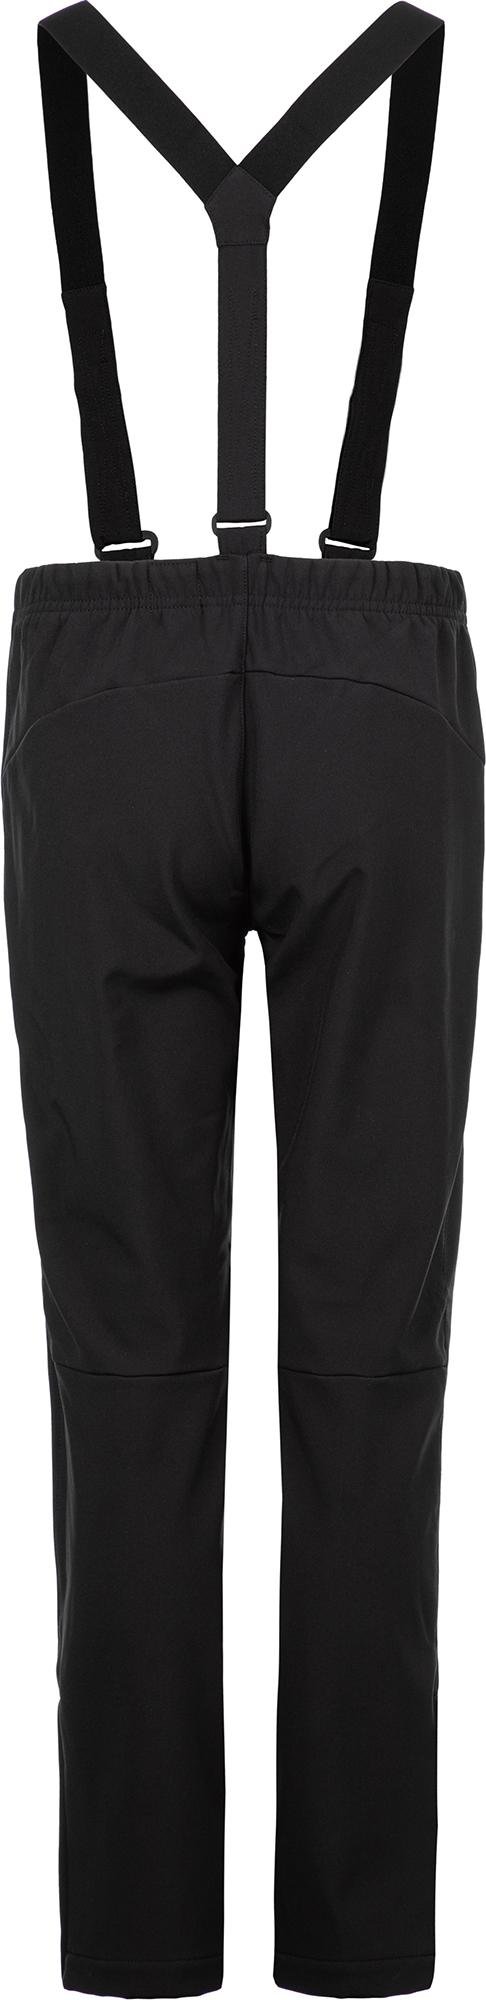 Nordway Брюки для девочек Nordway, размер 134 nordway куртка утепленная мужская nordway размер 46